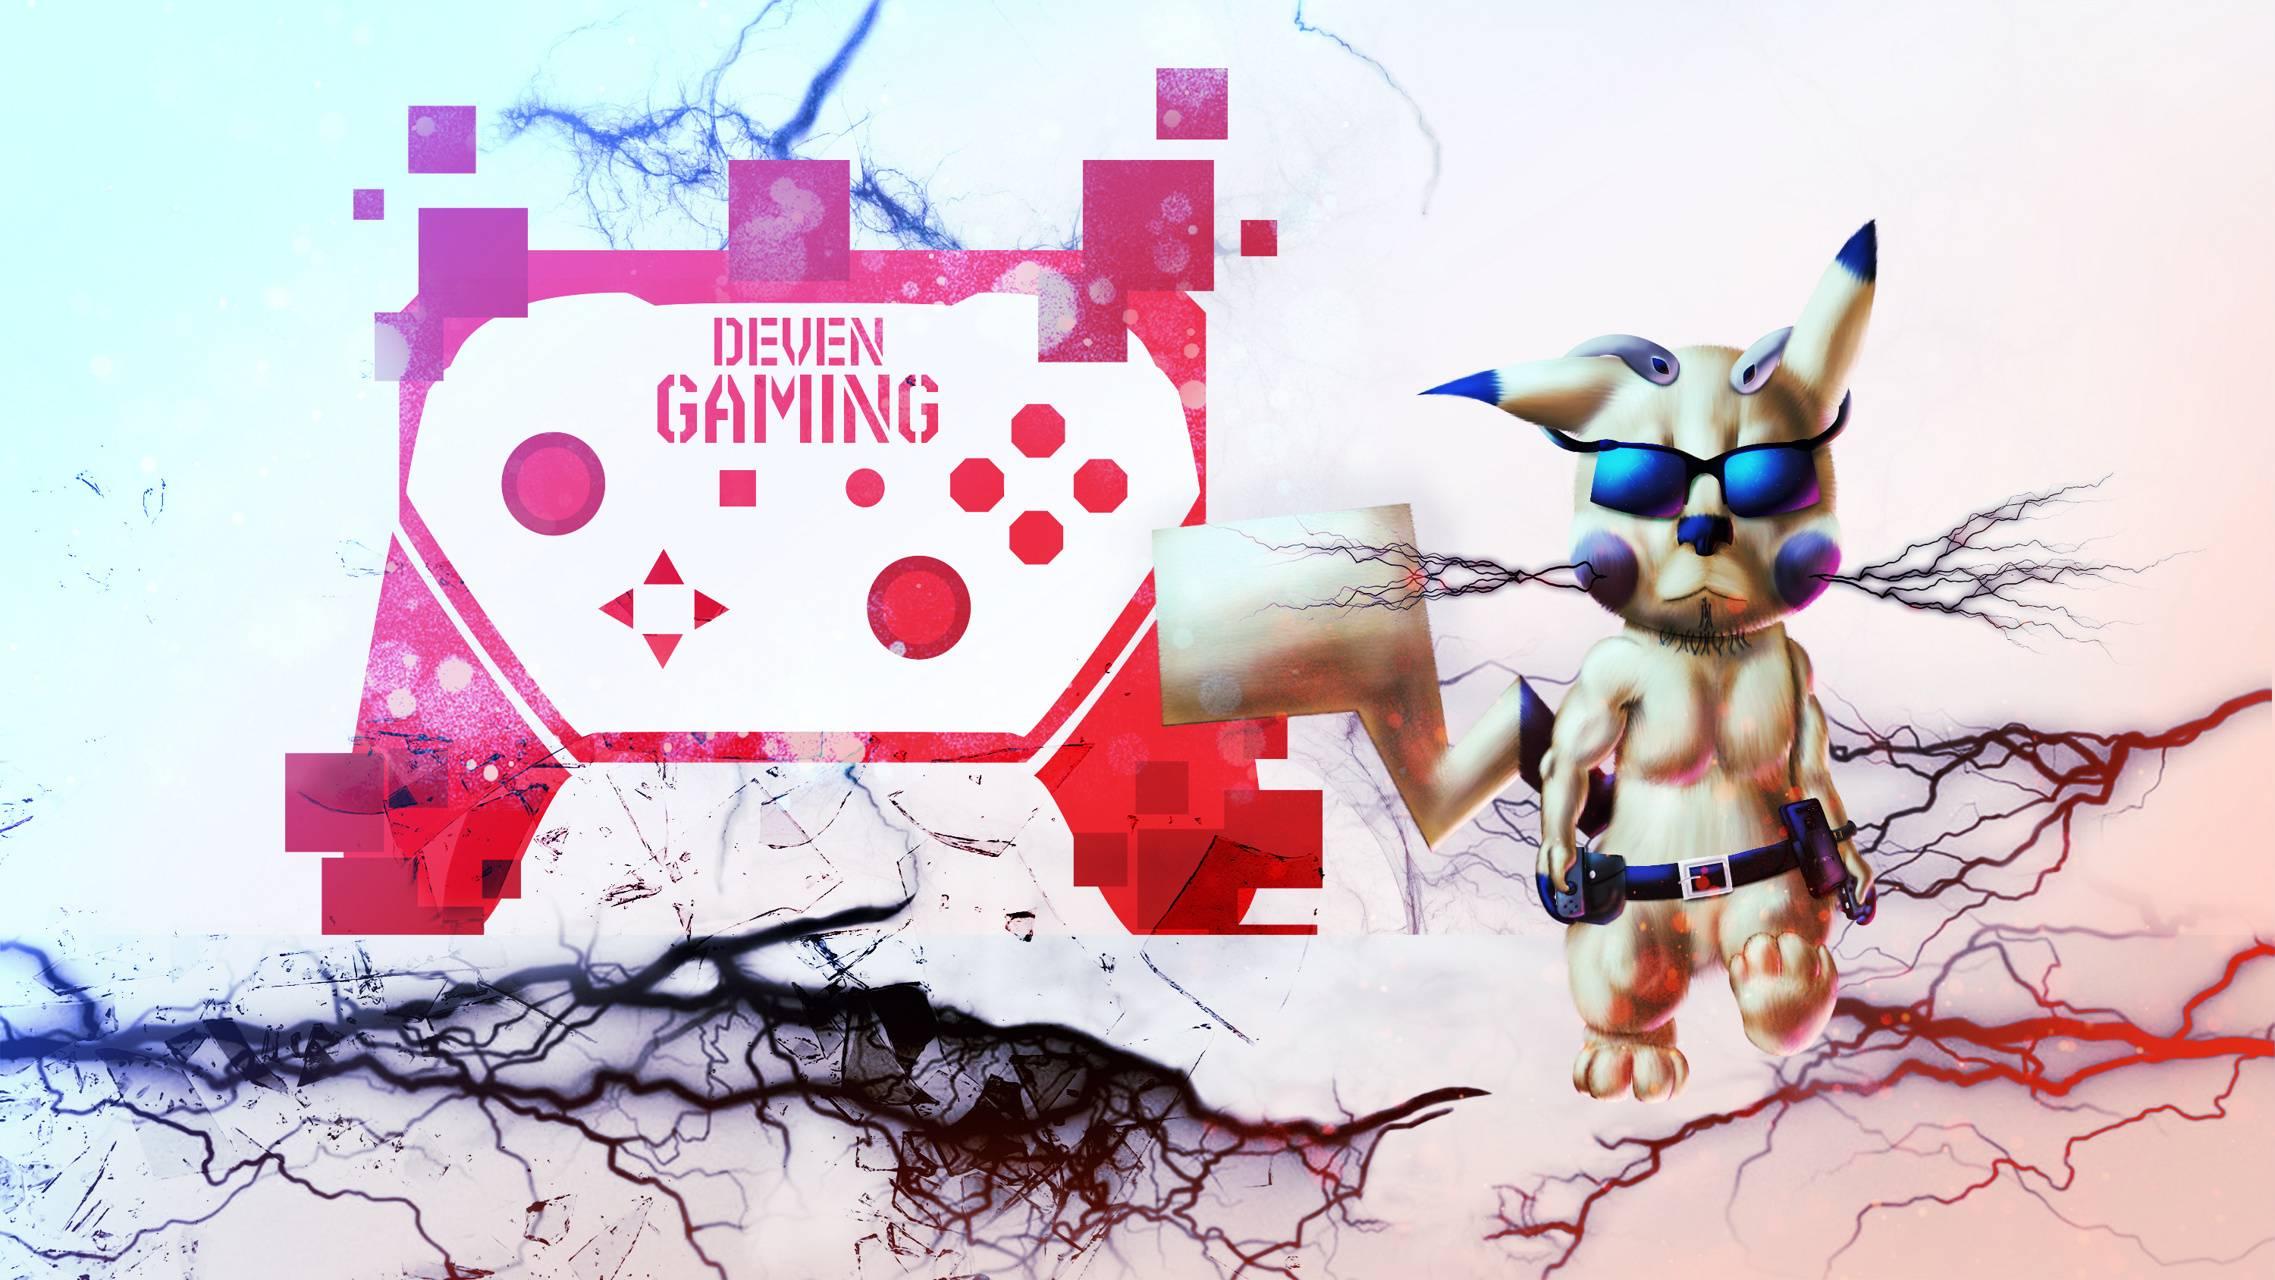 Deven Gaming